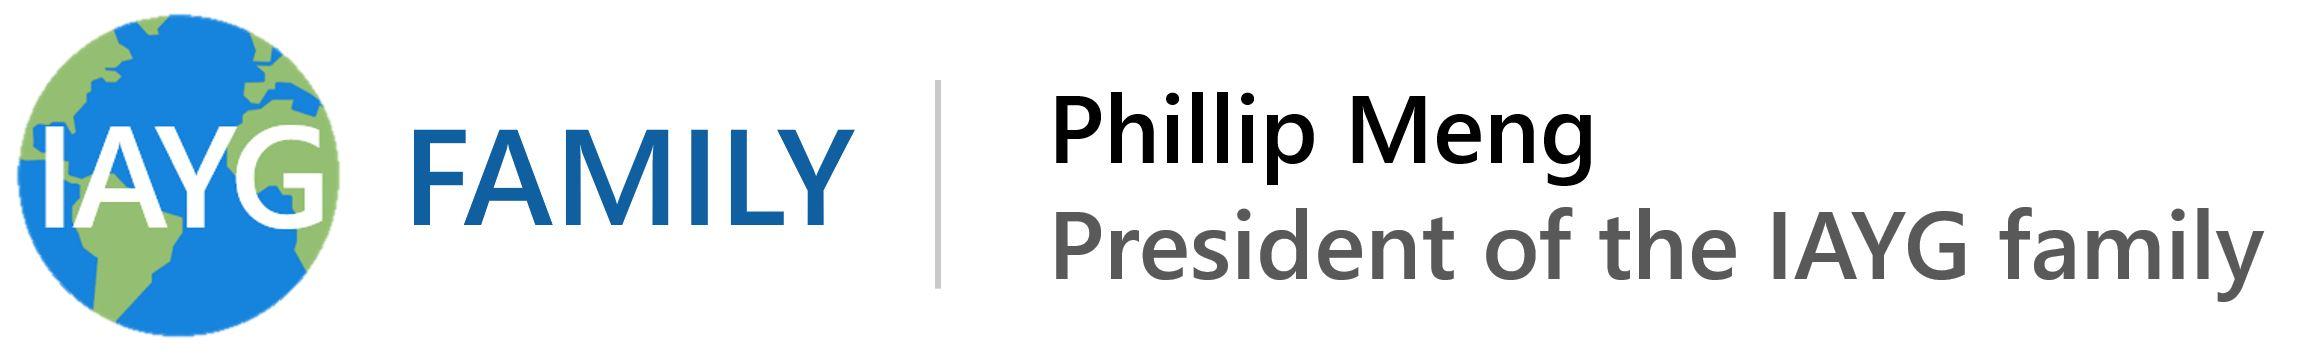 Phillip Meng | President of the IAYG Family